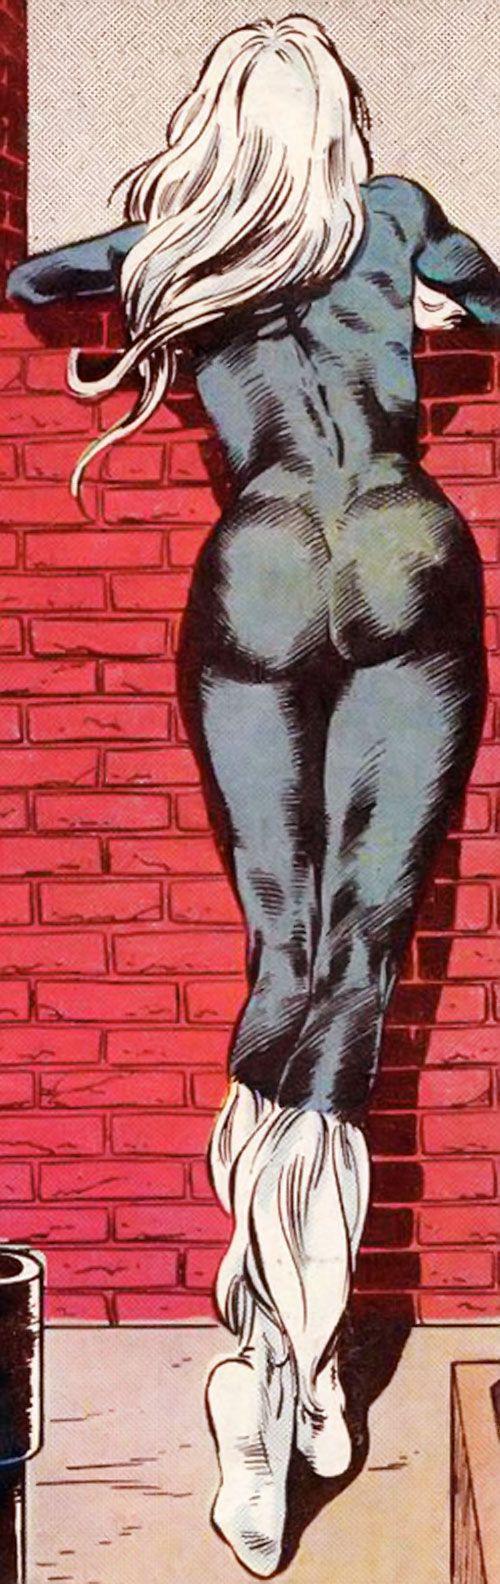 Black Cat (Spider-Man character) (Marvel Comics) rear view